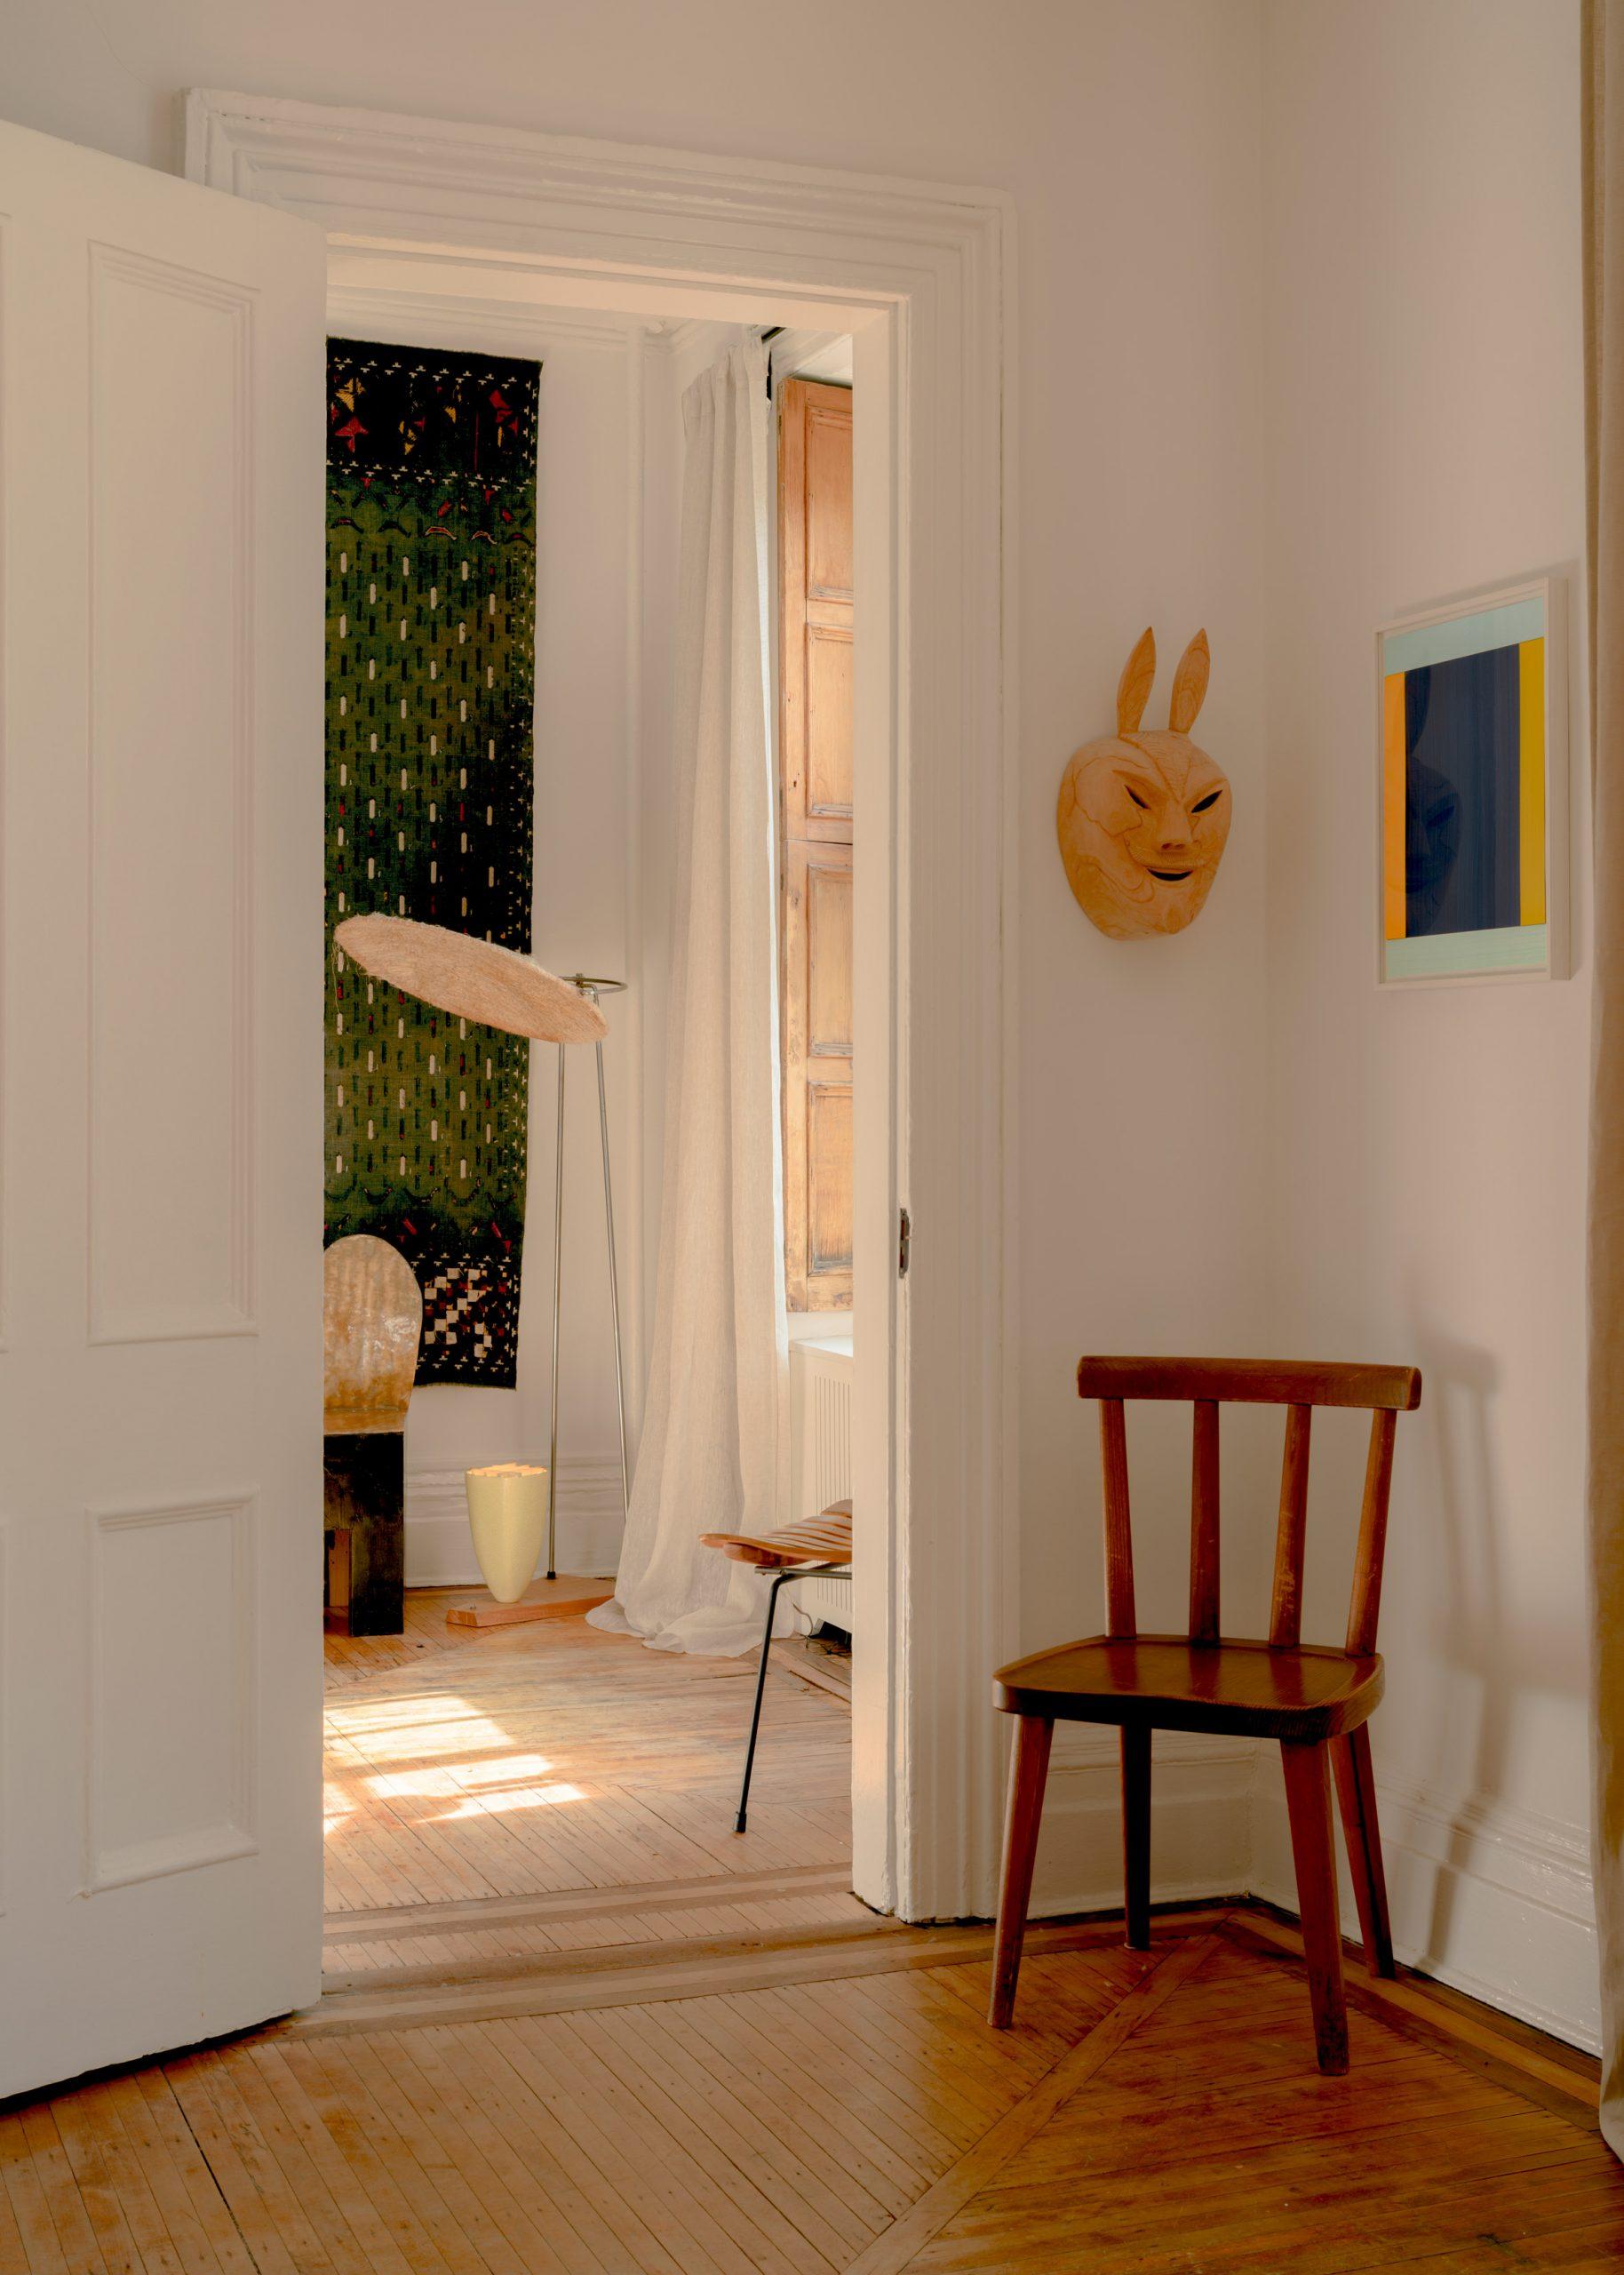 Olivier Garcé apartment